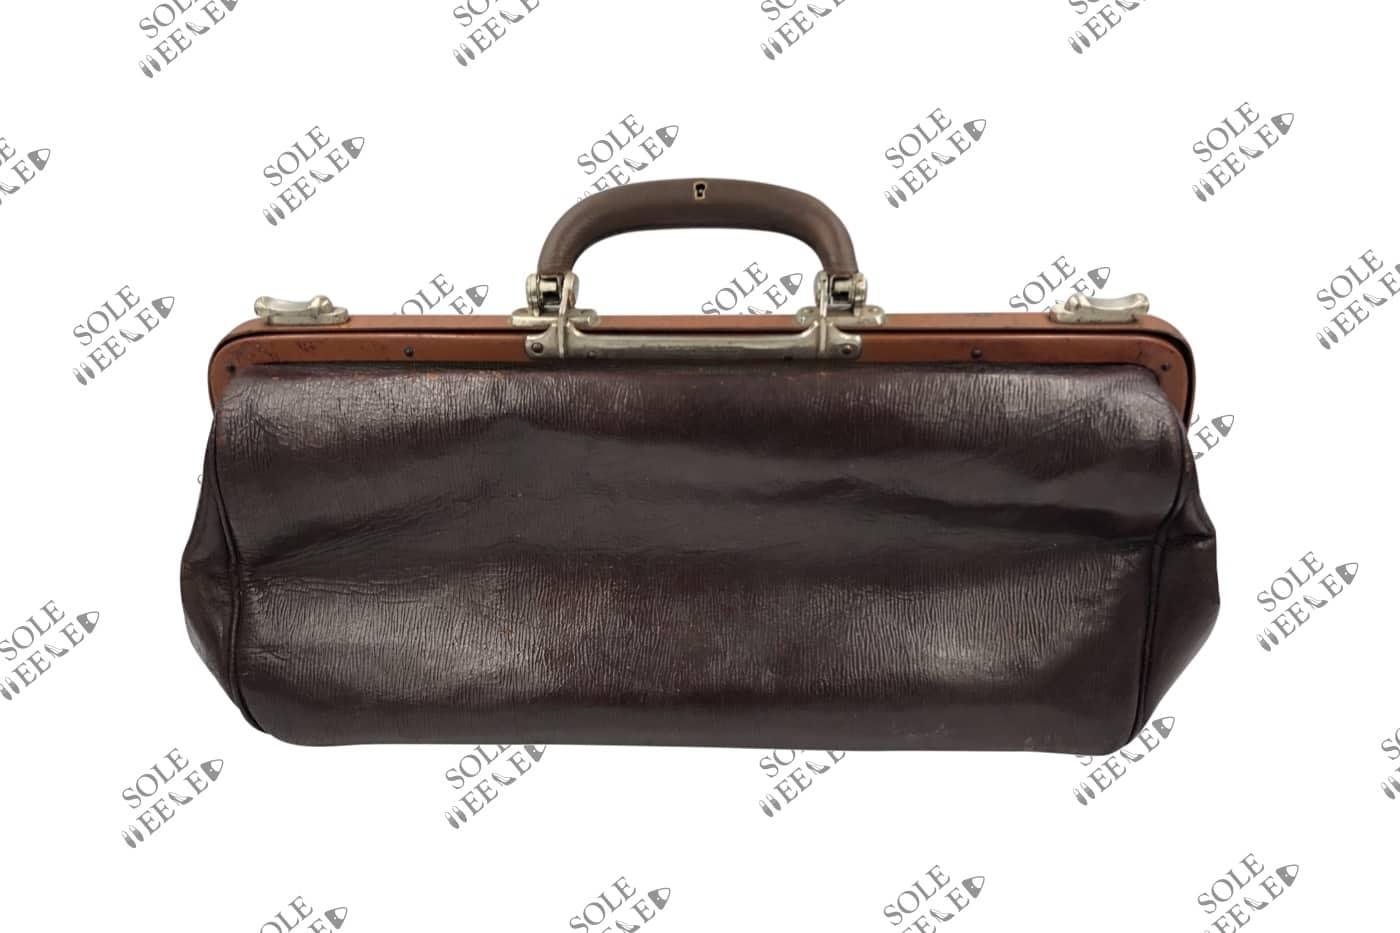 Vintage Briefcase Handle Repair